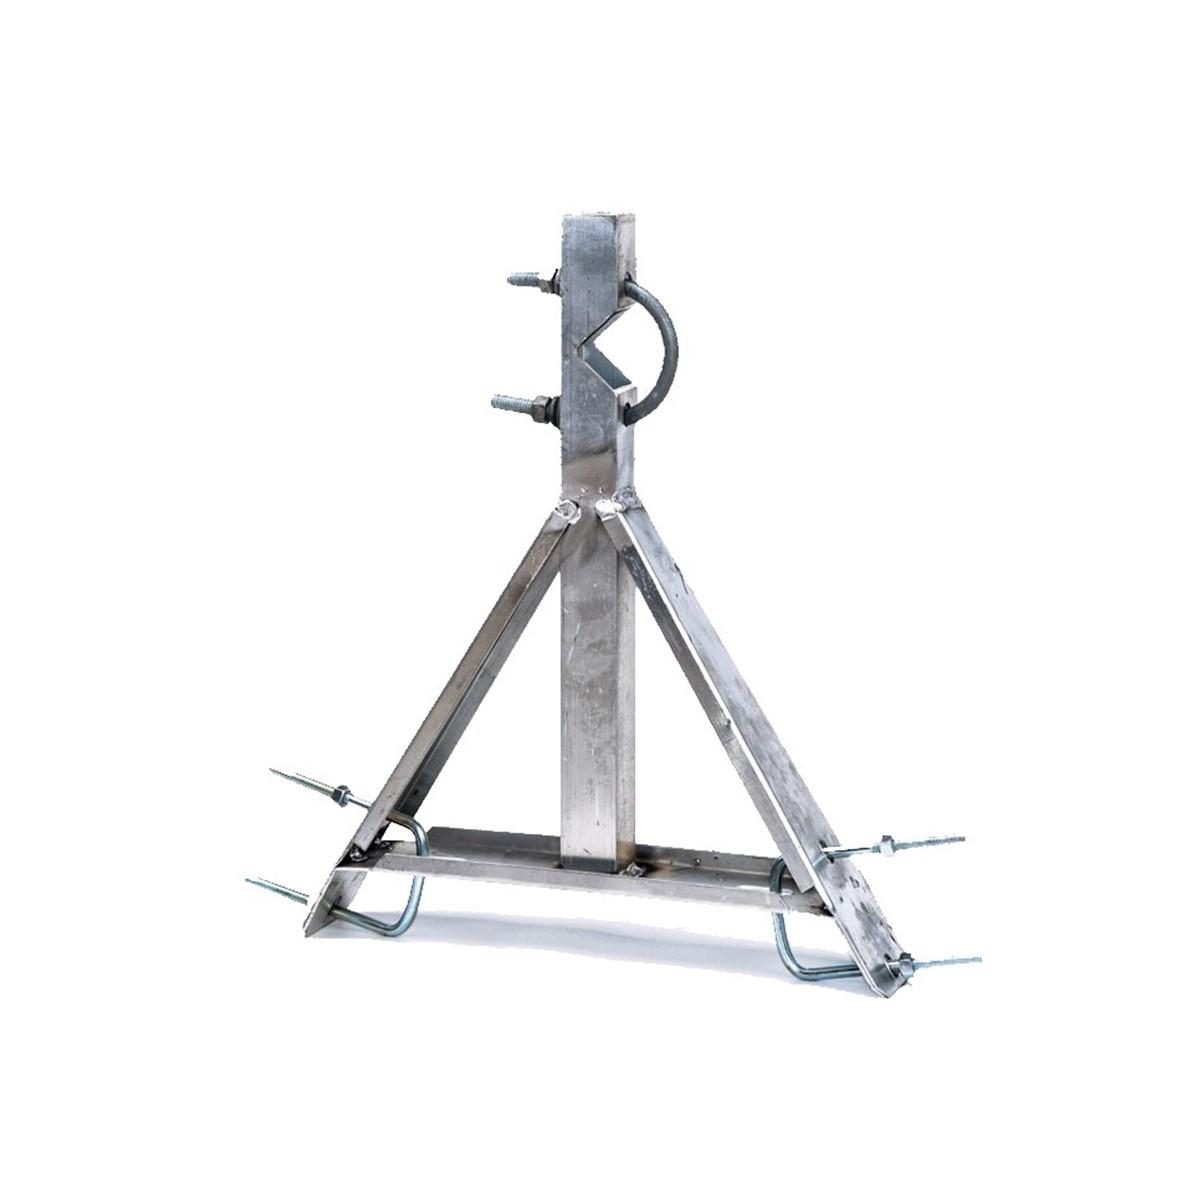 Soporte lateral de antena para torre ventada